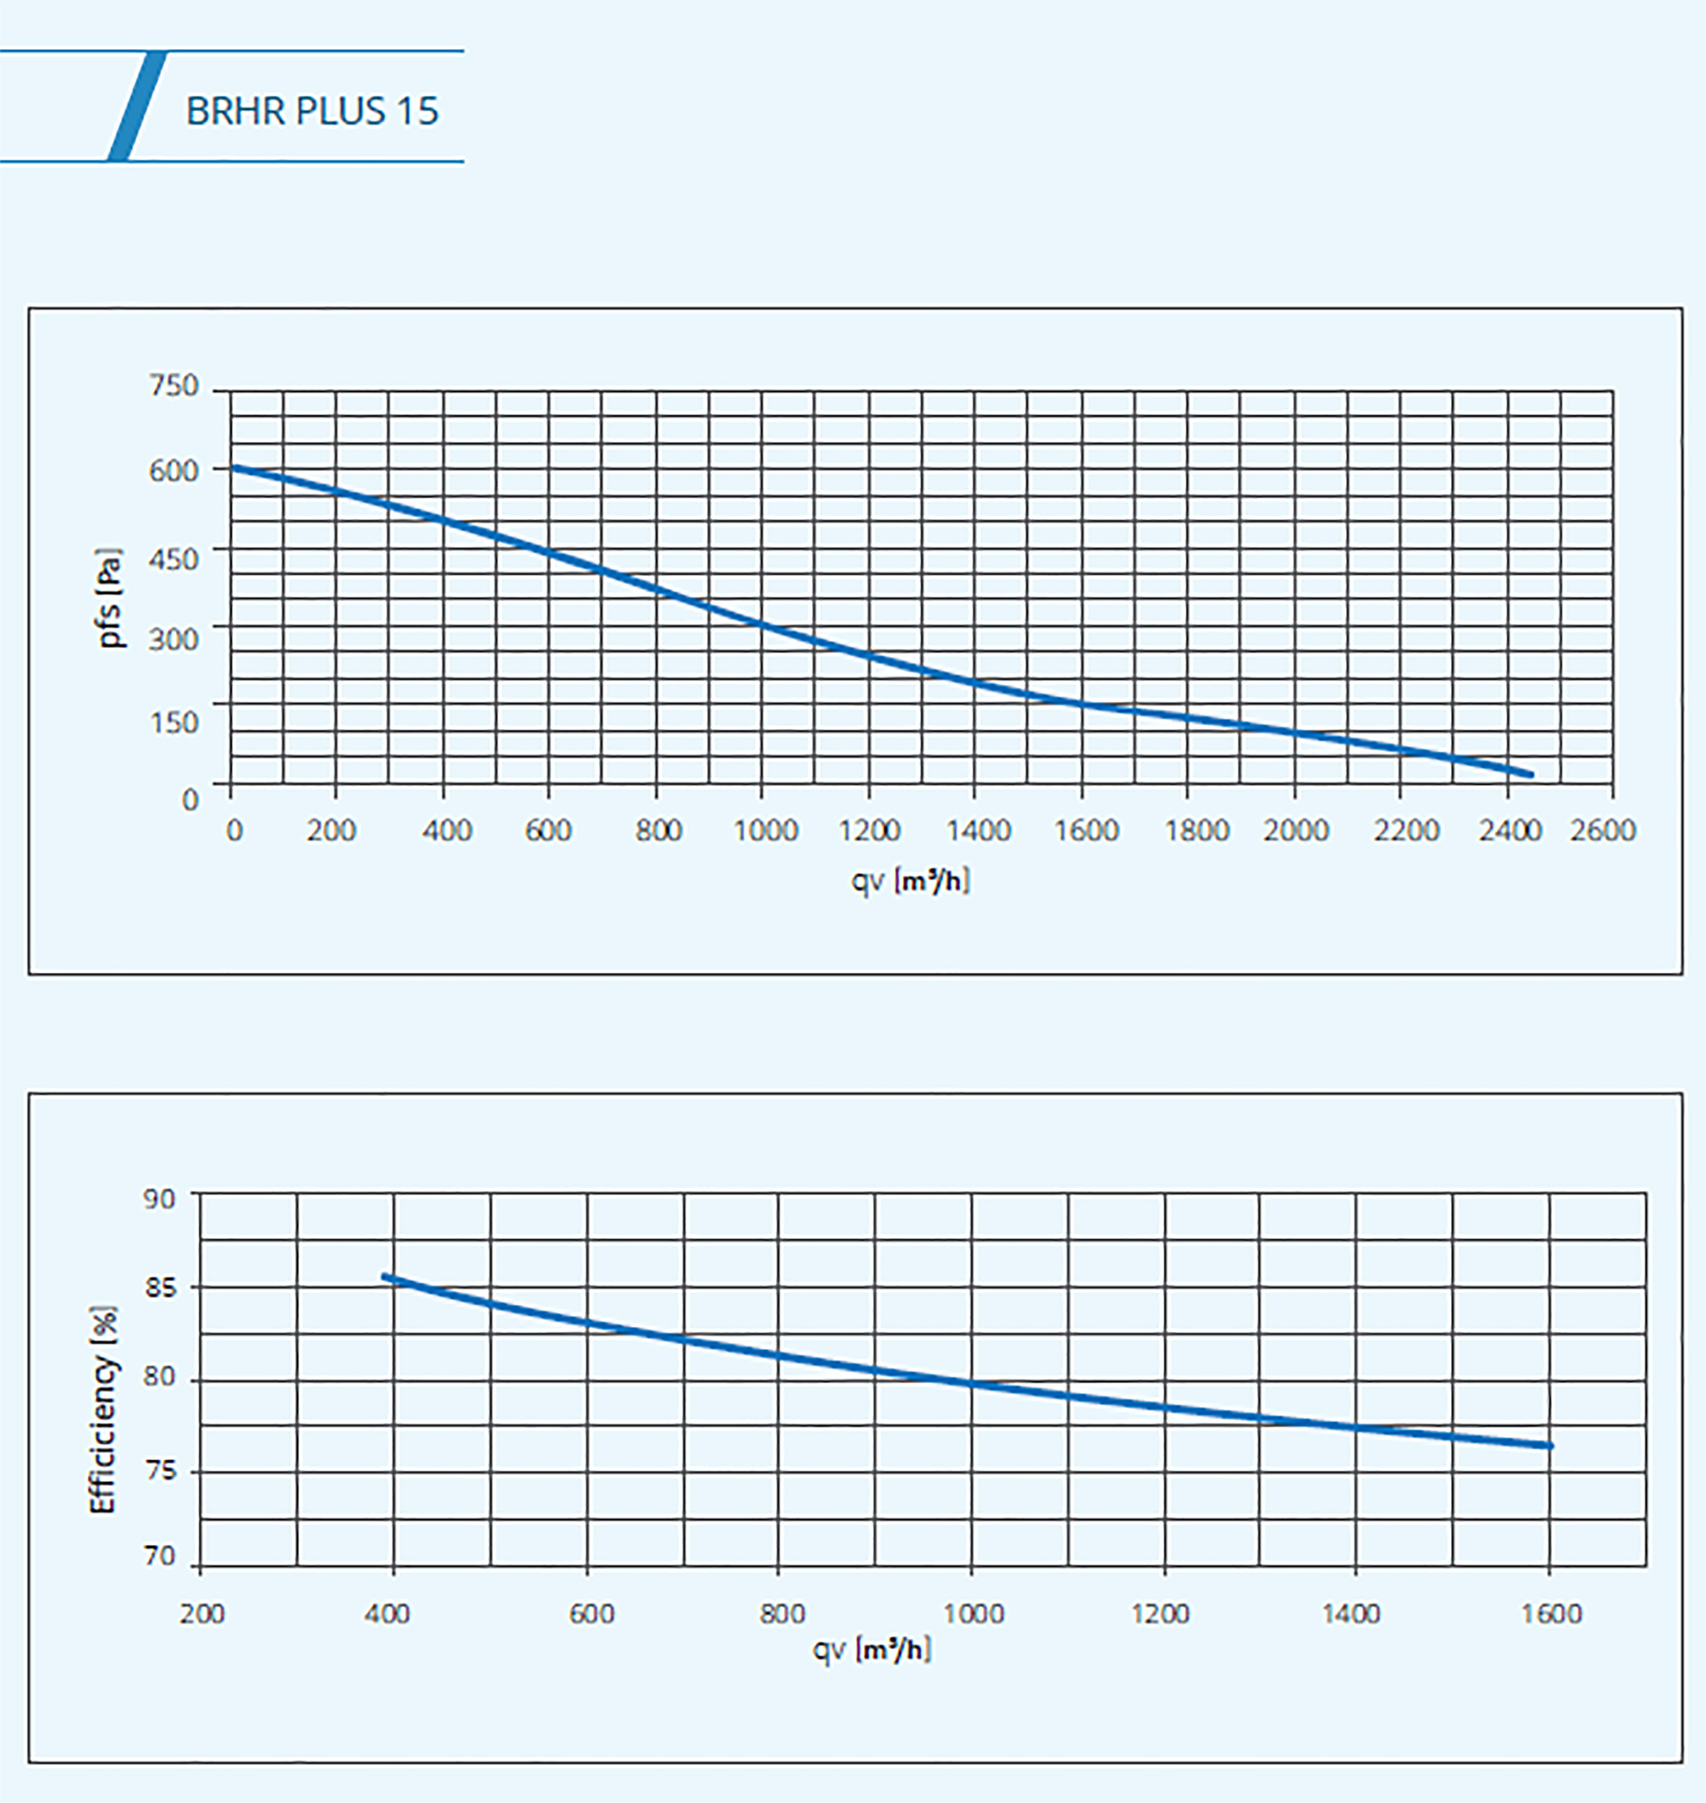 BSK plus 15 graph